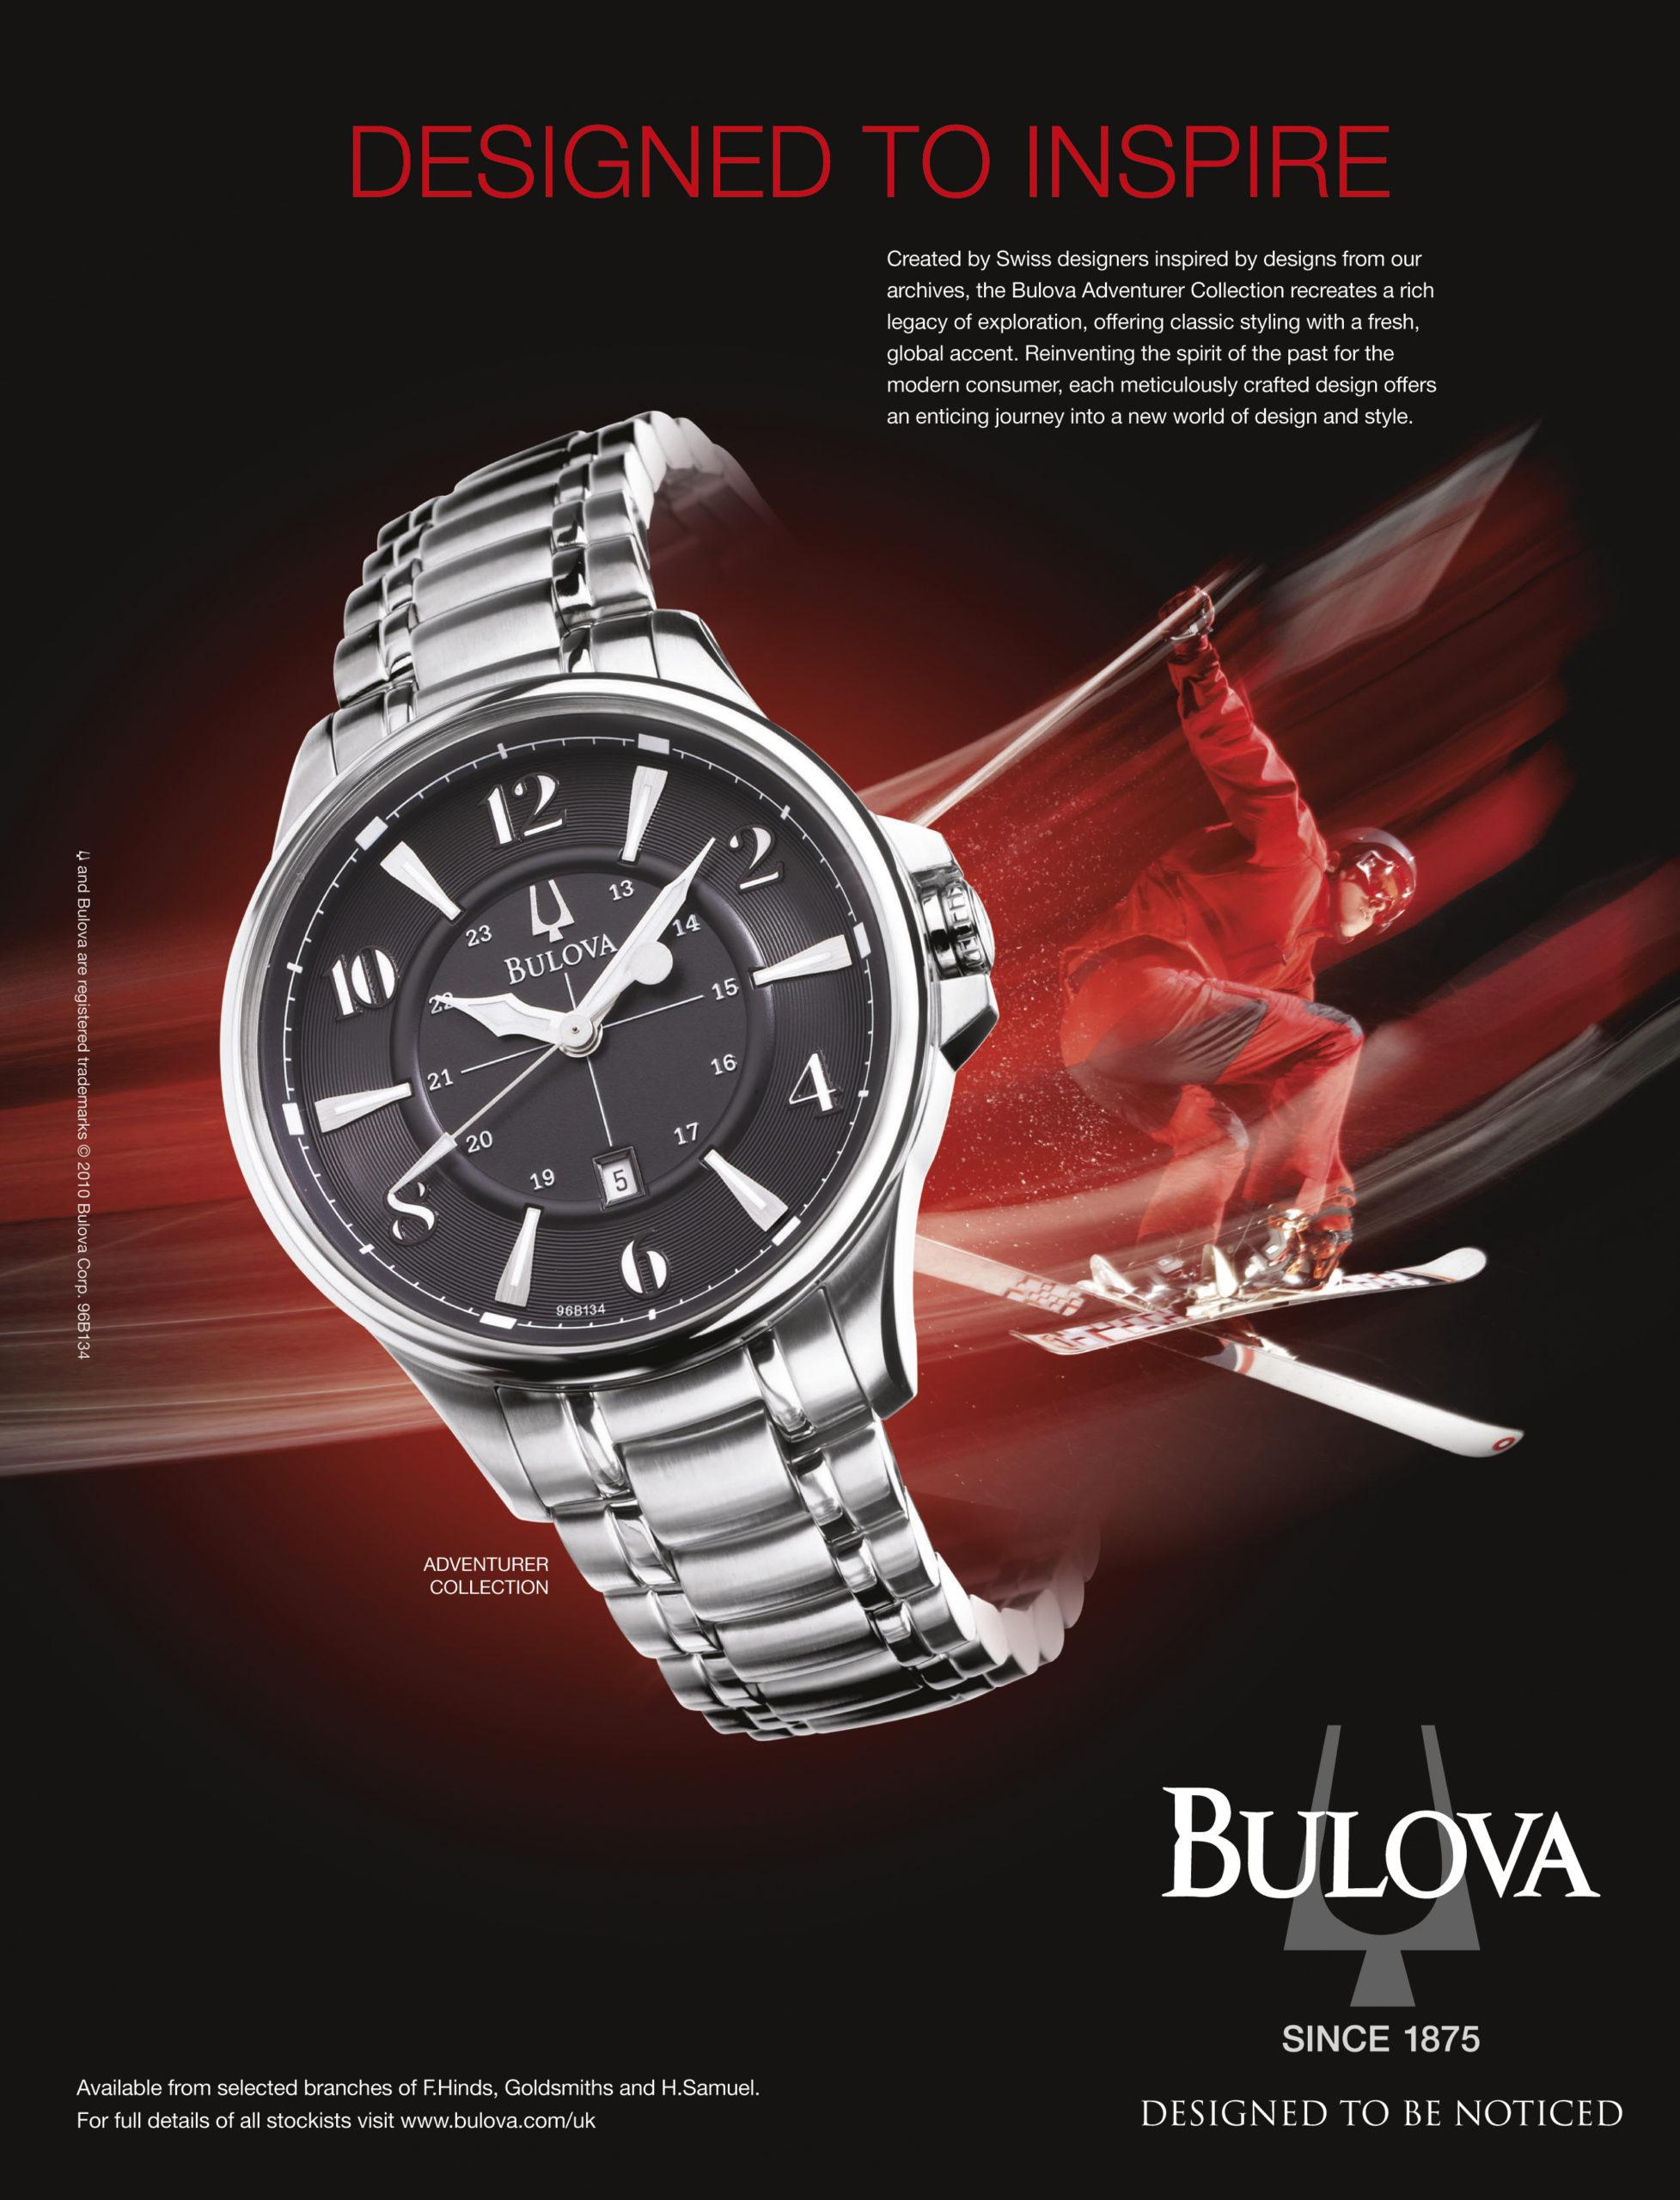 Bulova Designed to inspire